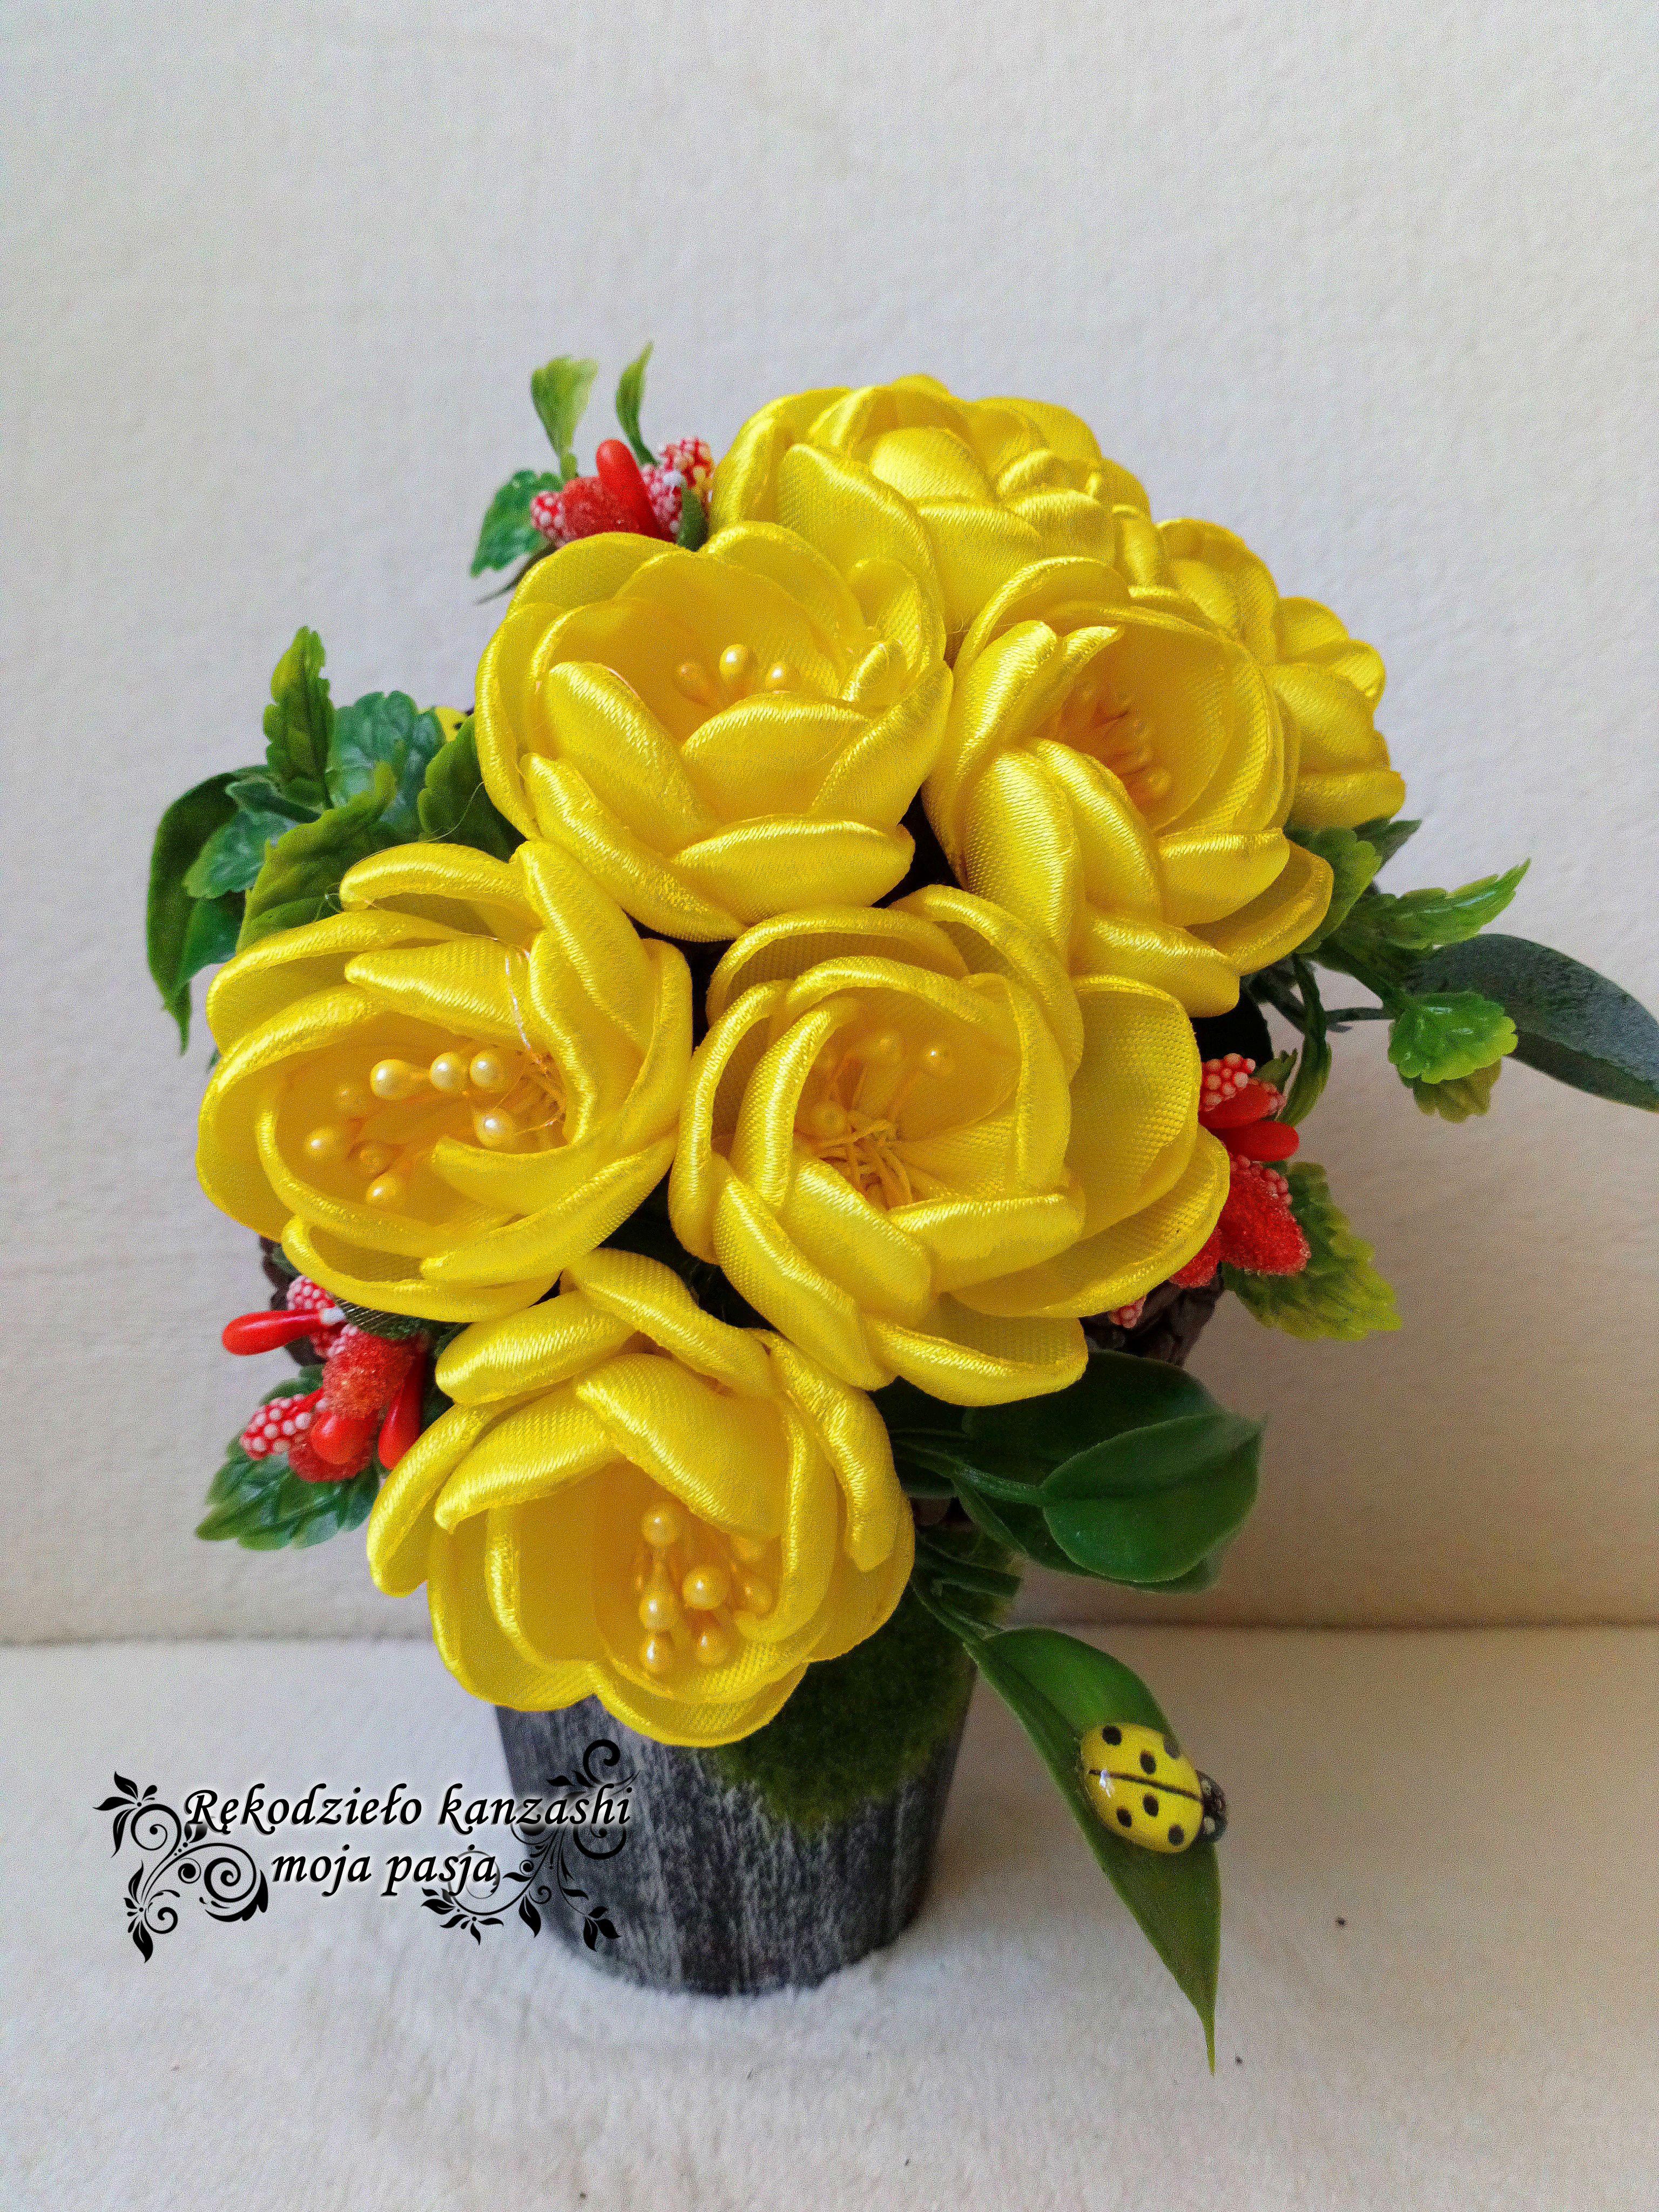 Flower Box Kawowy Na Doniczce Plants Rose Flowers